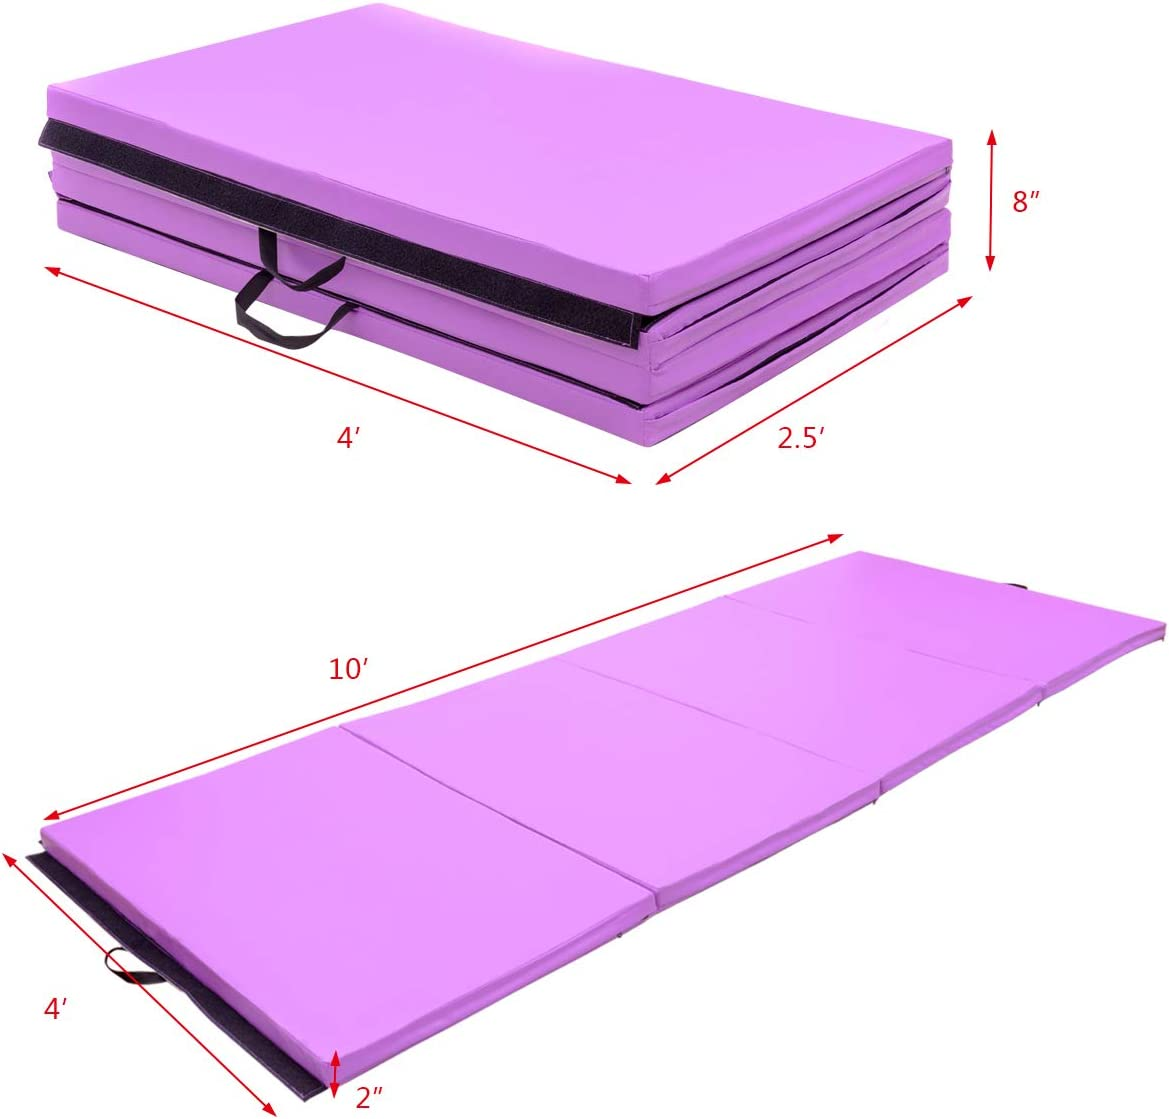 4x10x2 Folding Panel Gymnastics Tumbling Mat for Gym Home Fitness Exercise Gymax Gym Thick Panel